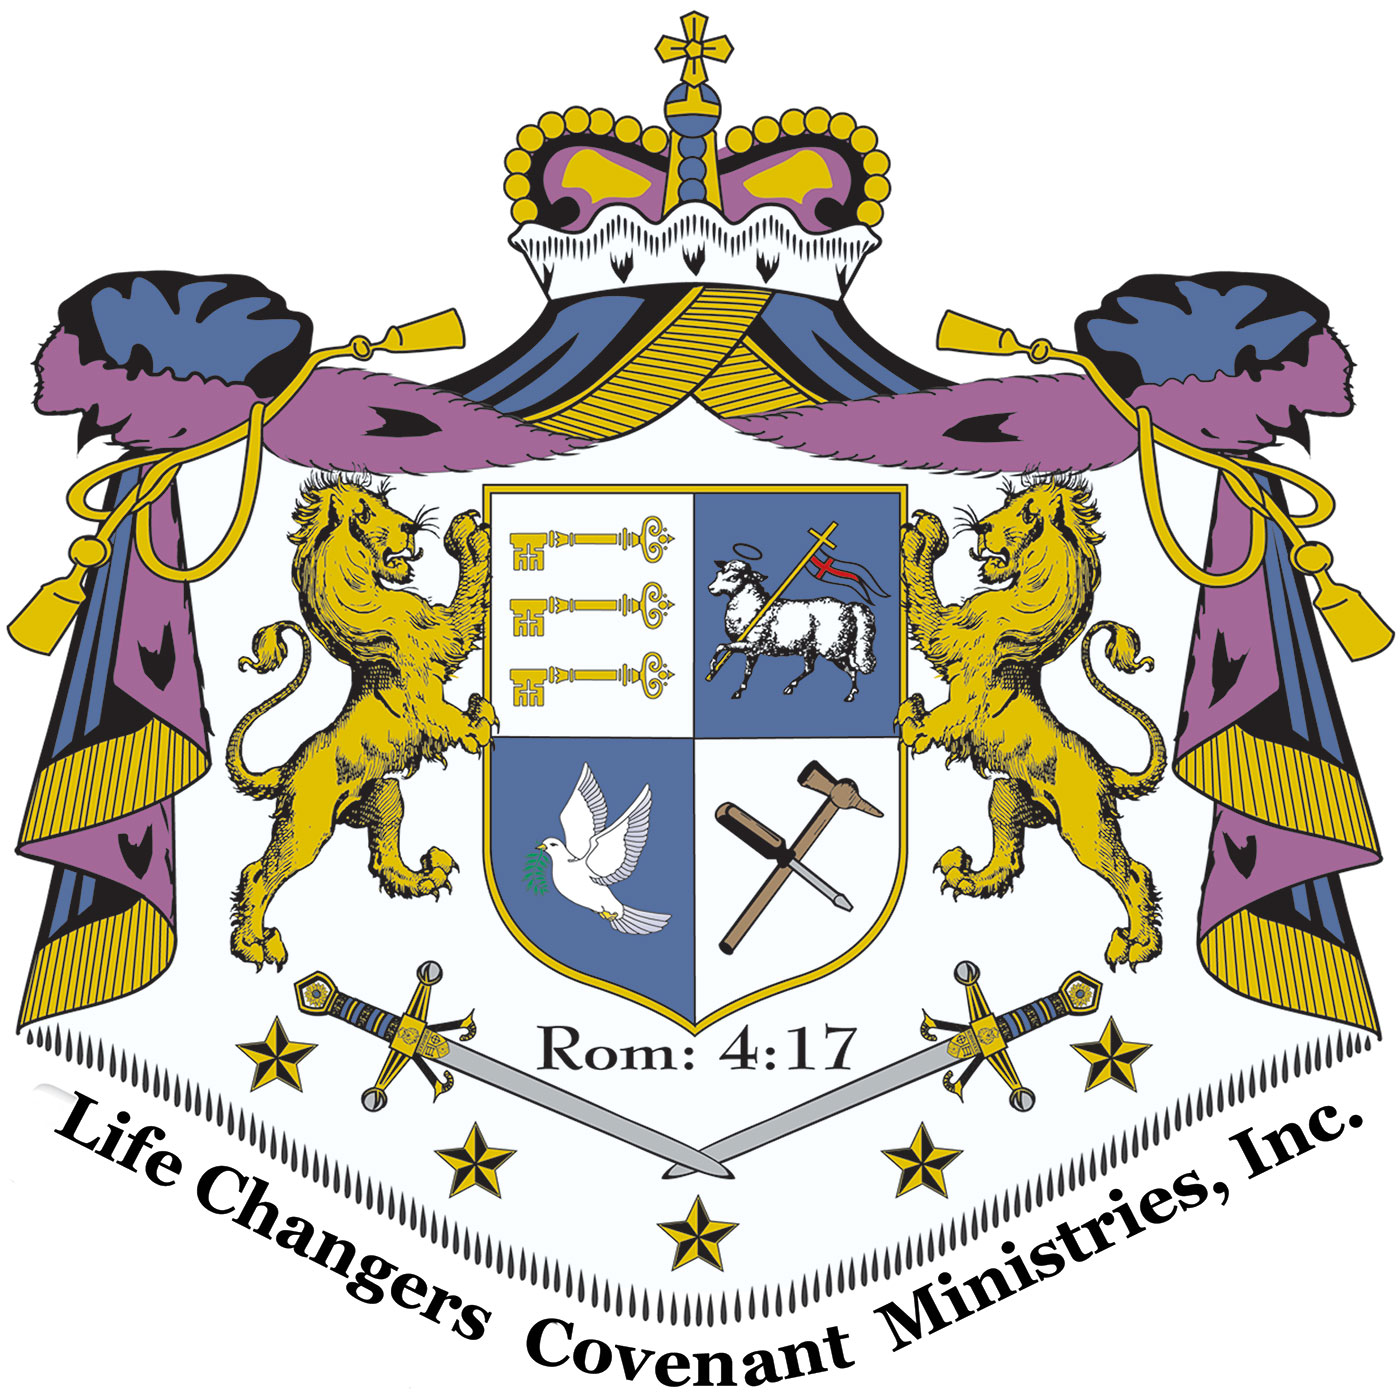 Charlie Redish Ministries logo